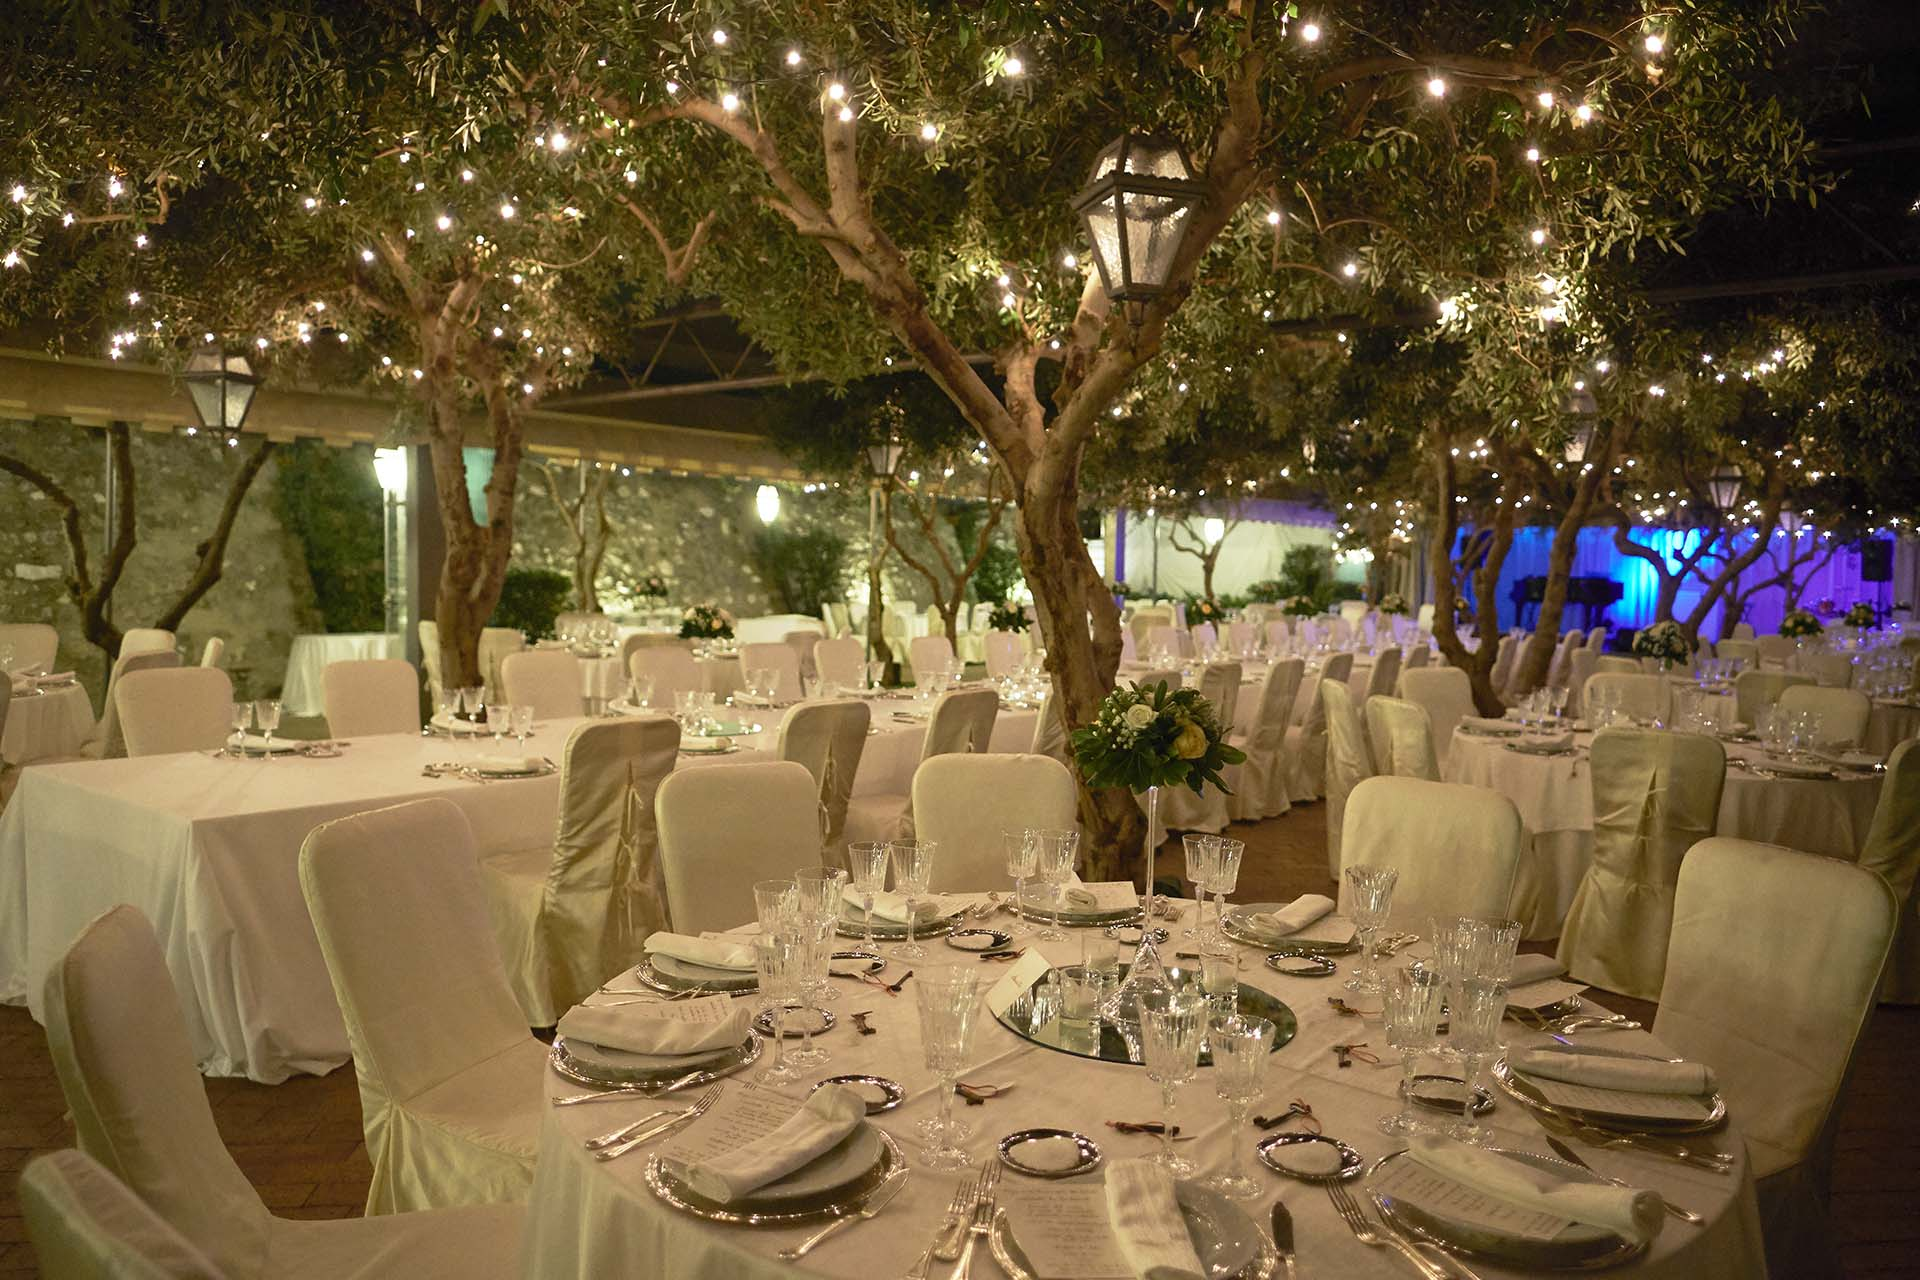 Matrimonio Sire Ricevimenti Allestimenti floreali, mise en place, buffet